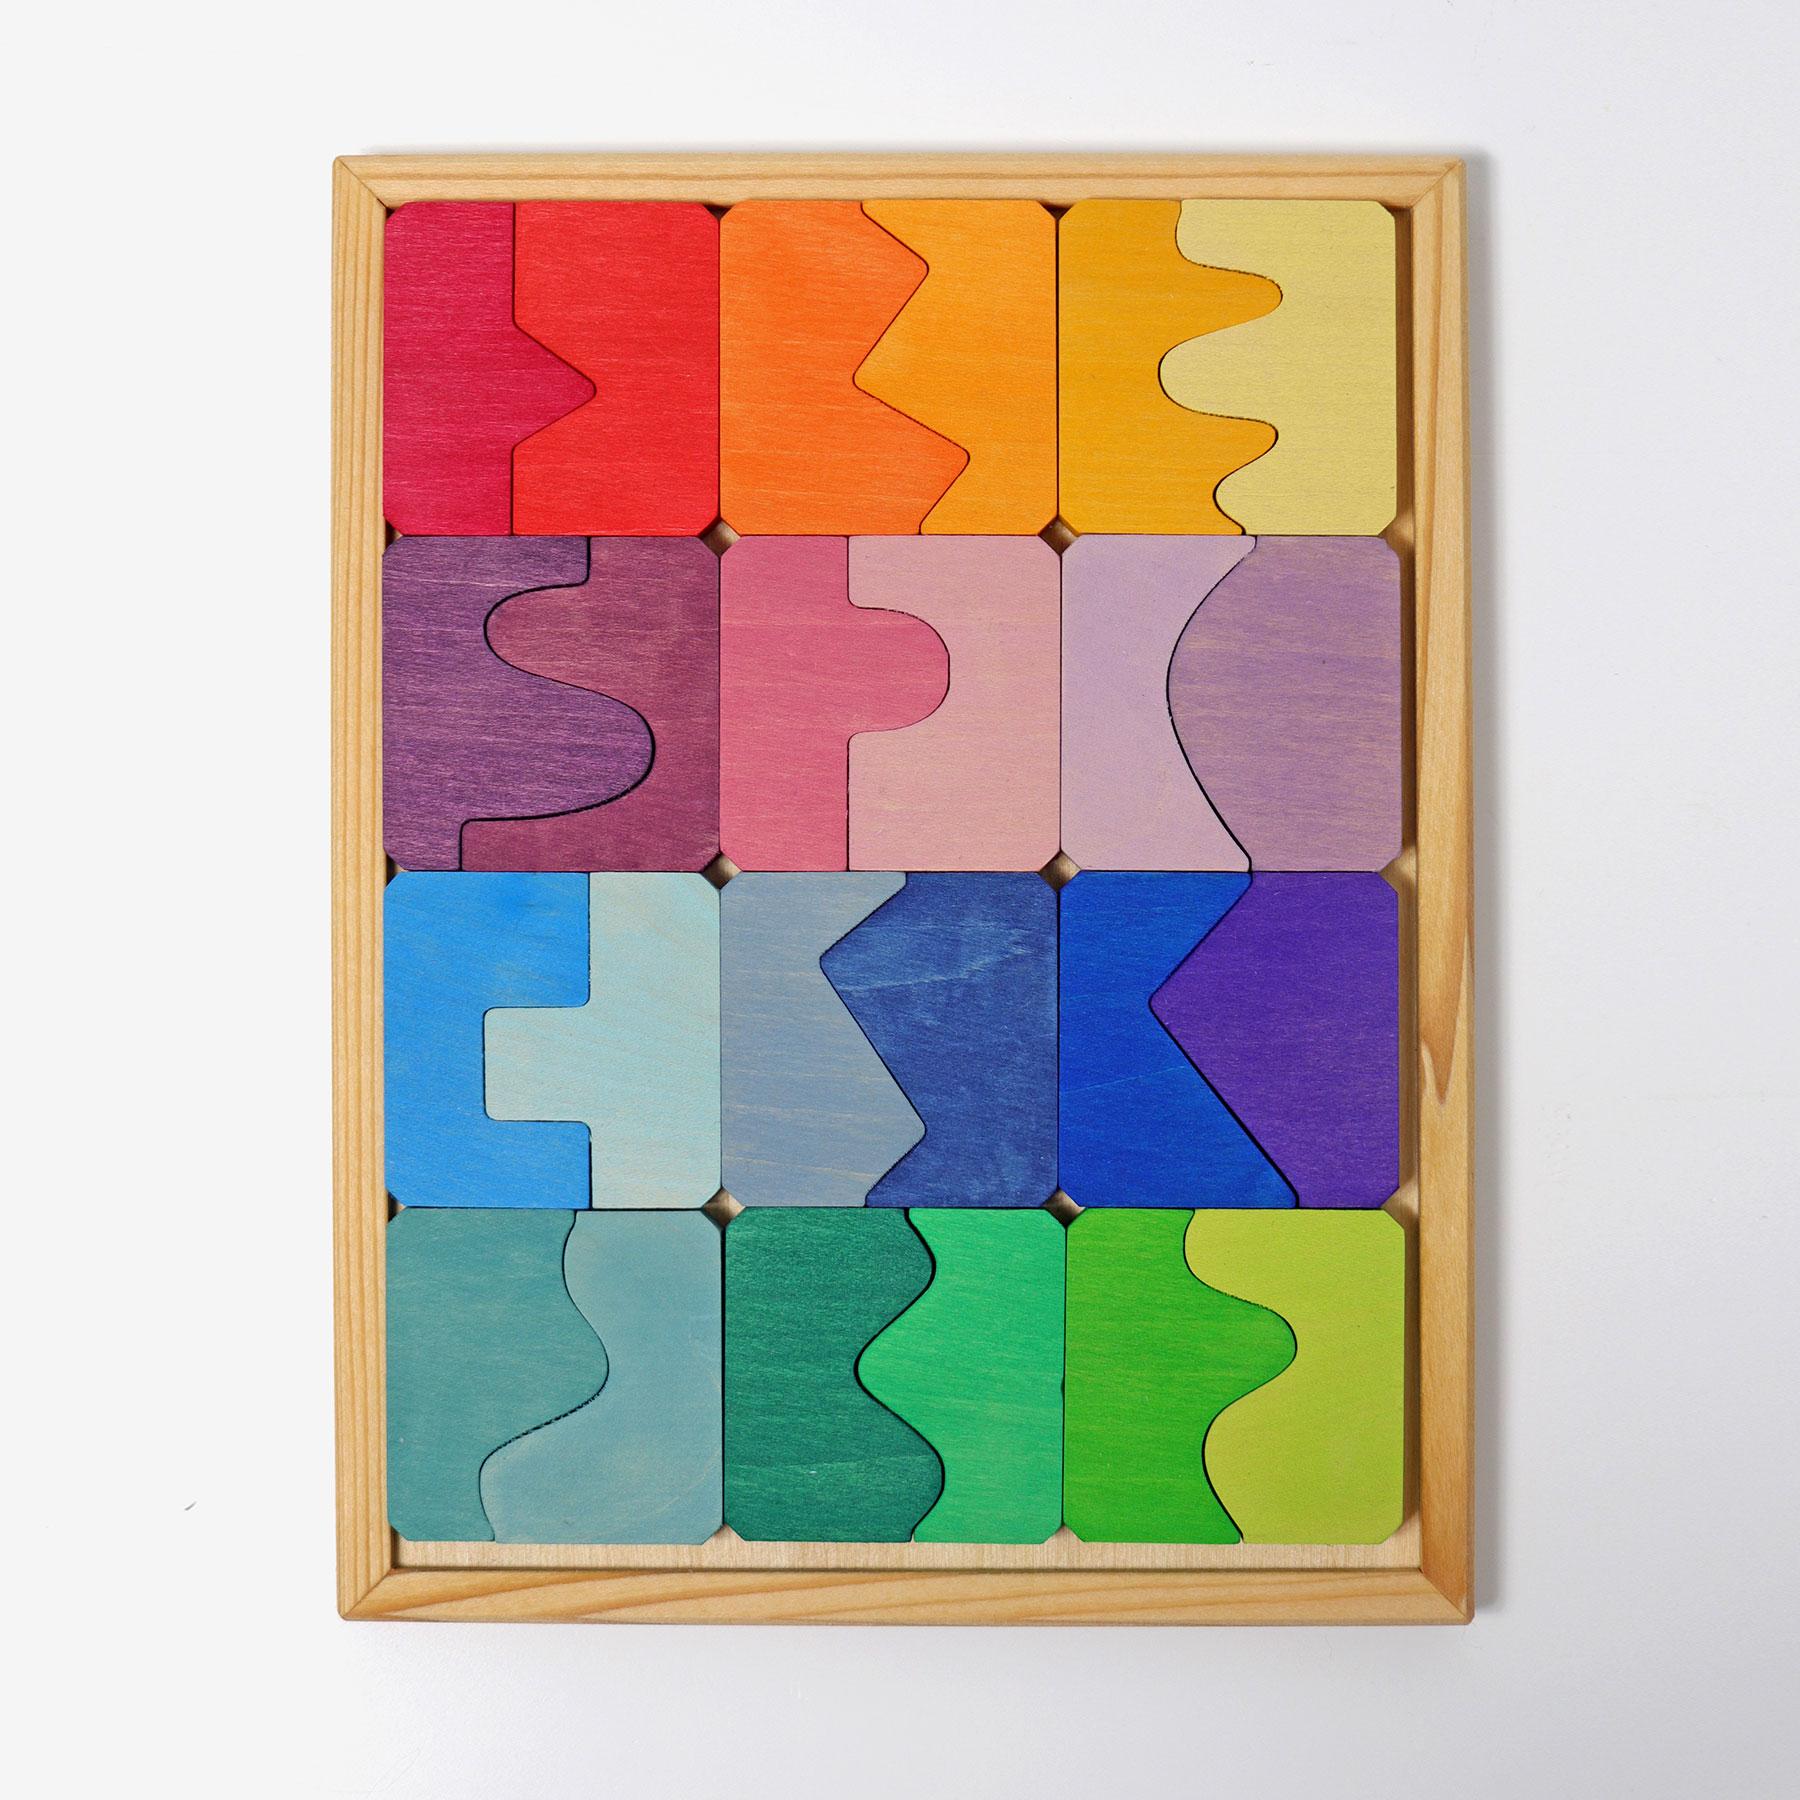 Puzzle Côncavo e Convexo - Grimm's